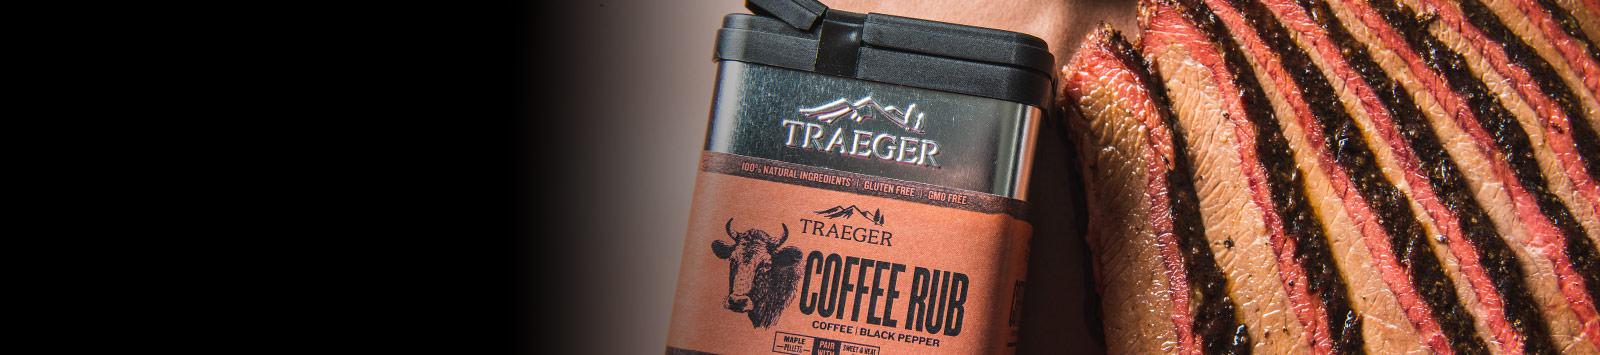 karykeuma-traeger-coffee-spc172-4.jpg